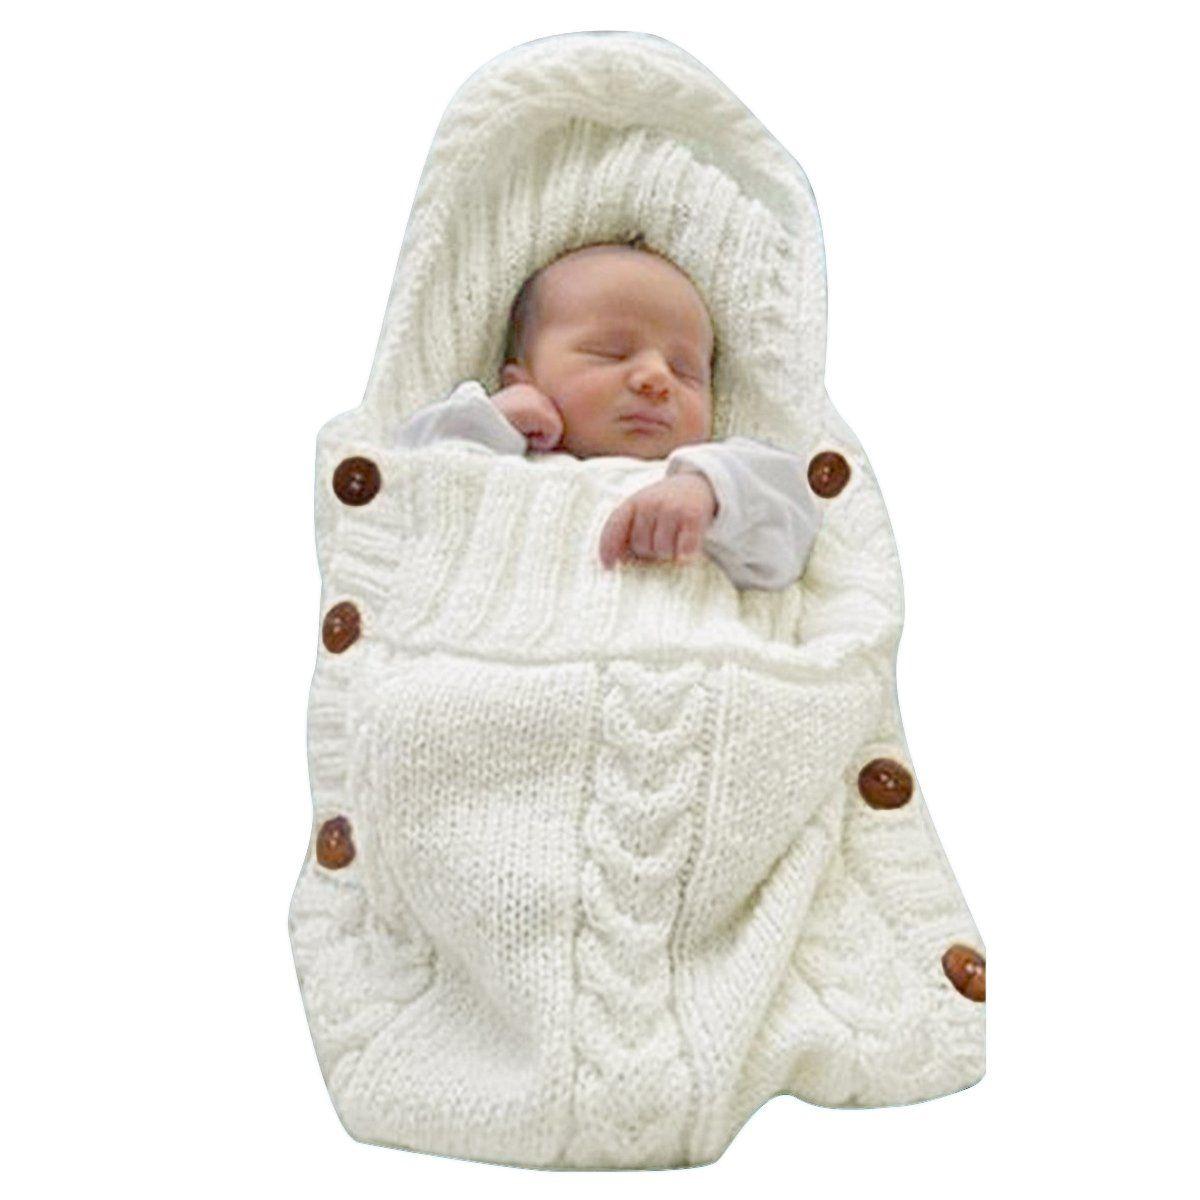 Baby Girl Boy Wrap Swaddle Blanket Knit Sleeping Bag Sleep Sack for 0-12 Month